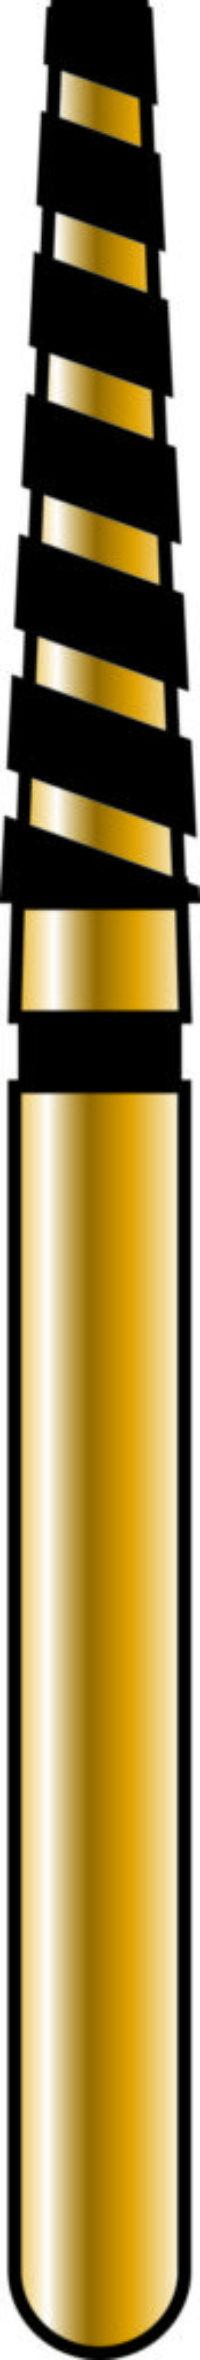 Flat End Taper 18-8mm Topspin Diamond